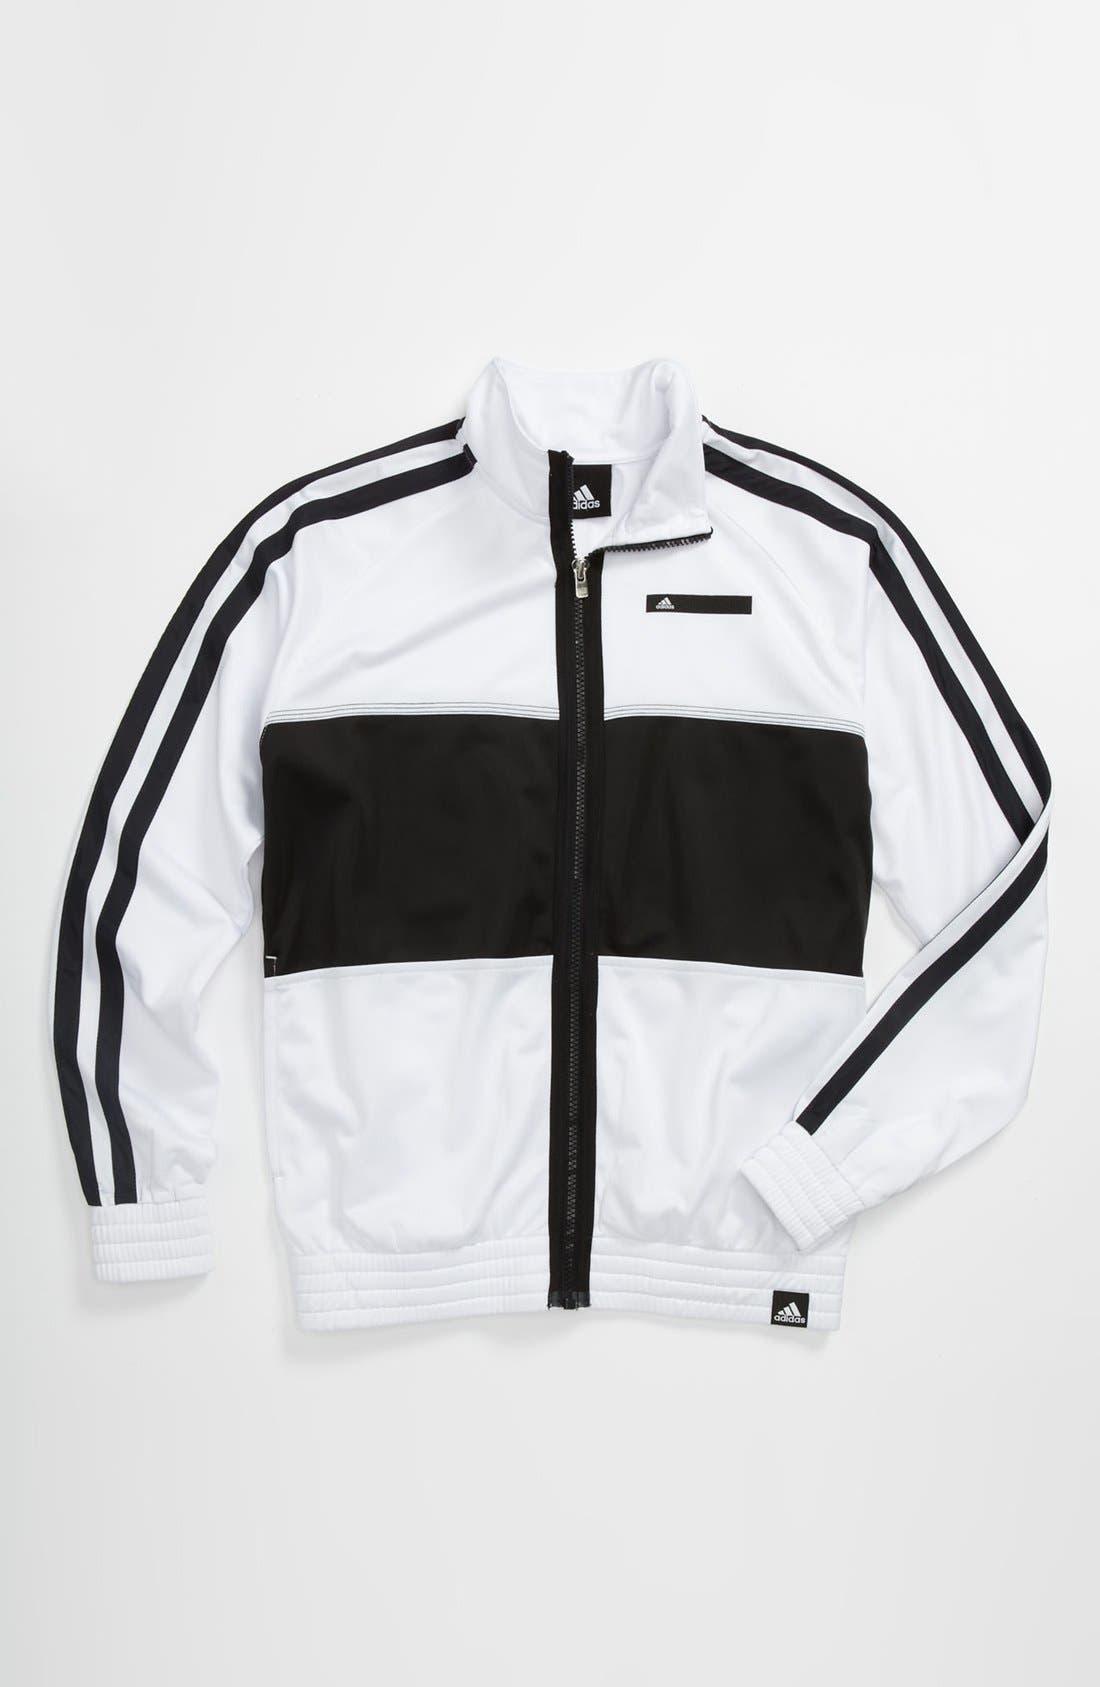 Alternate Image 1 Selected - adidas 'Fat Stripes' Jacket (Big Boys)